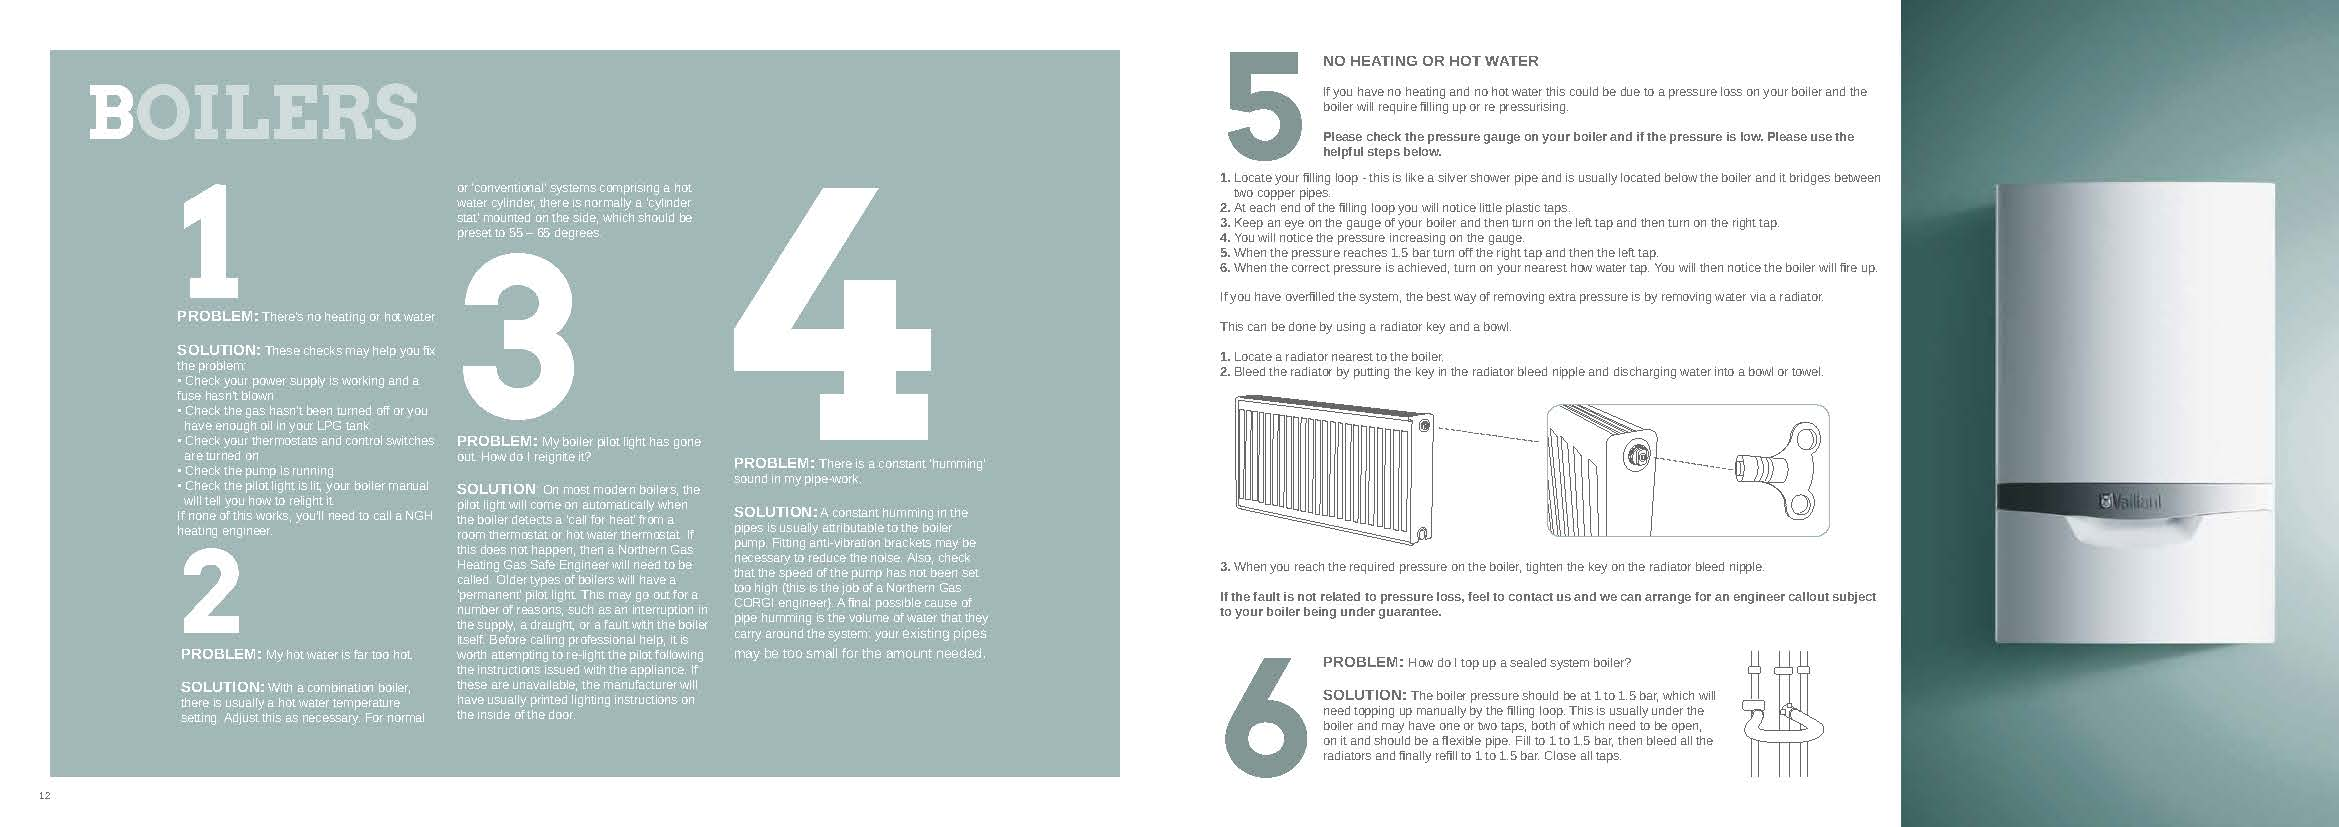 Gas Heating: Northern Gas Heating Free Boiler